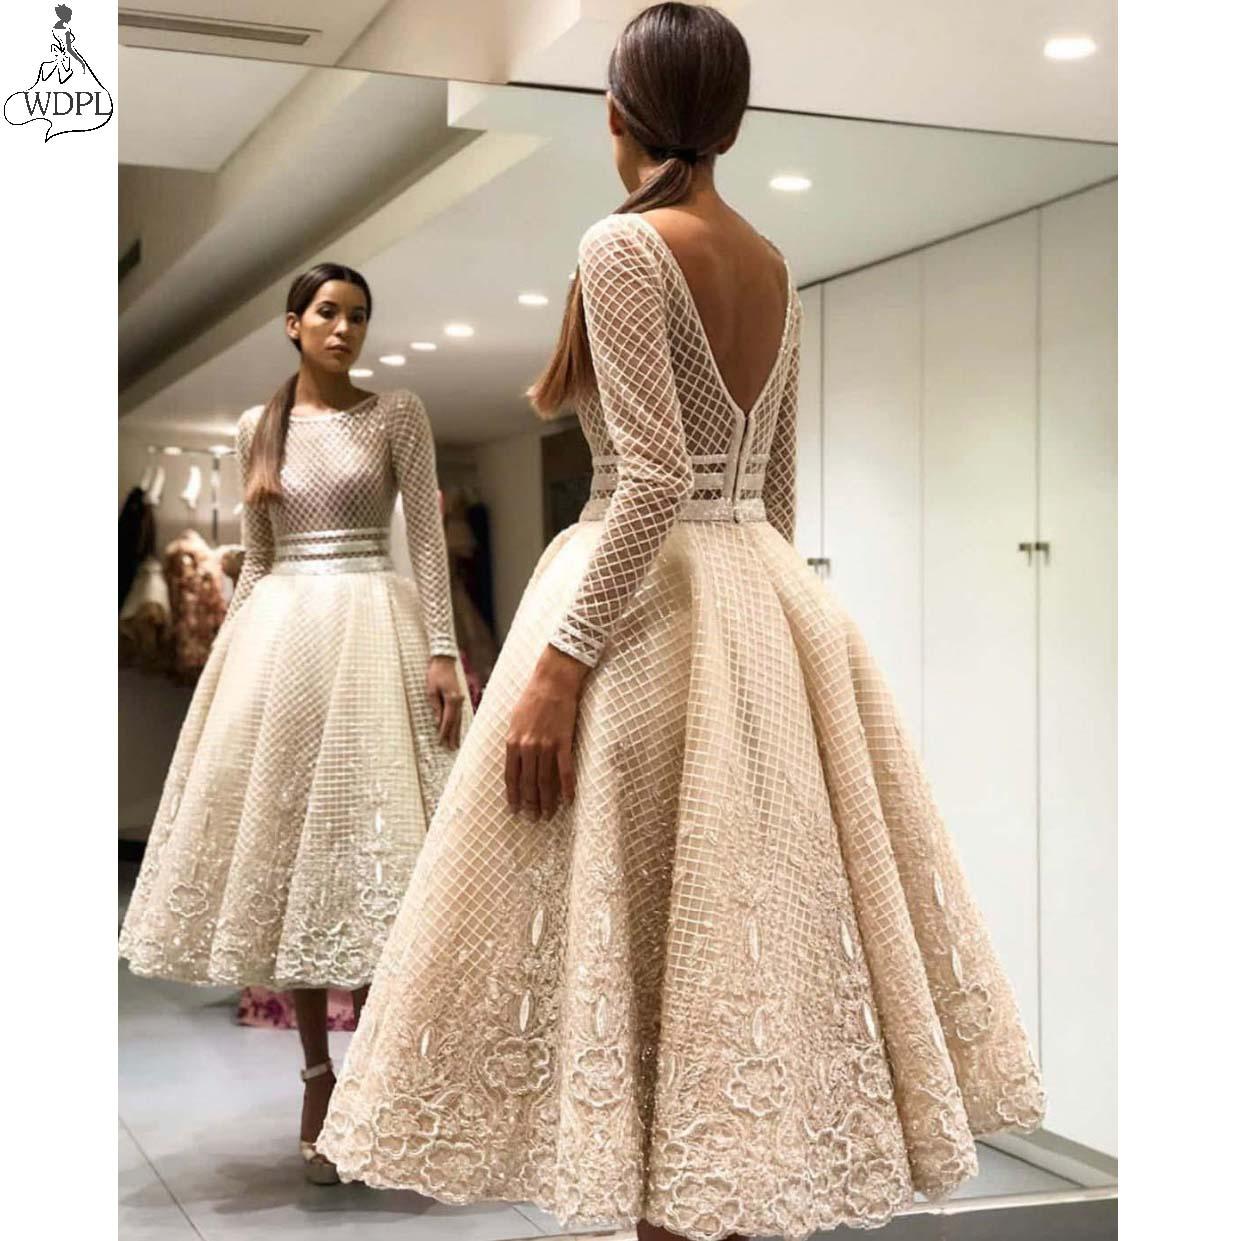 Robe de soiree Short   Prom     Dresses   Long Sleeve Chic Lace Applique Tea Length Evening   Dress   Arabic Women Formal Gowns Abendkleider